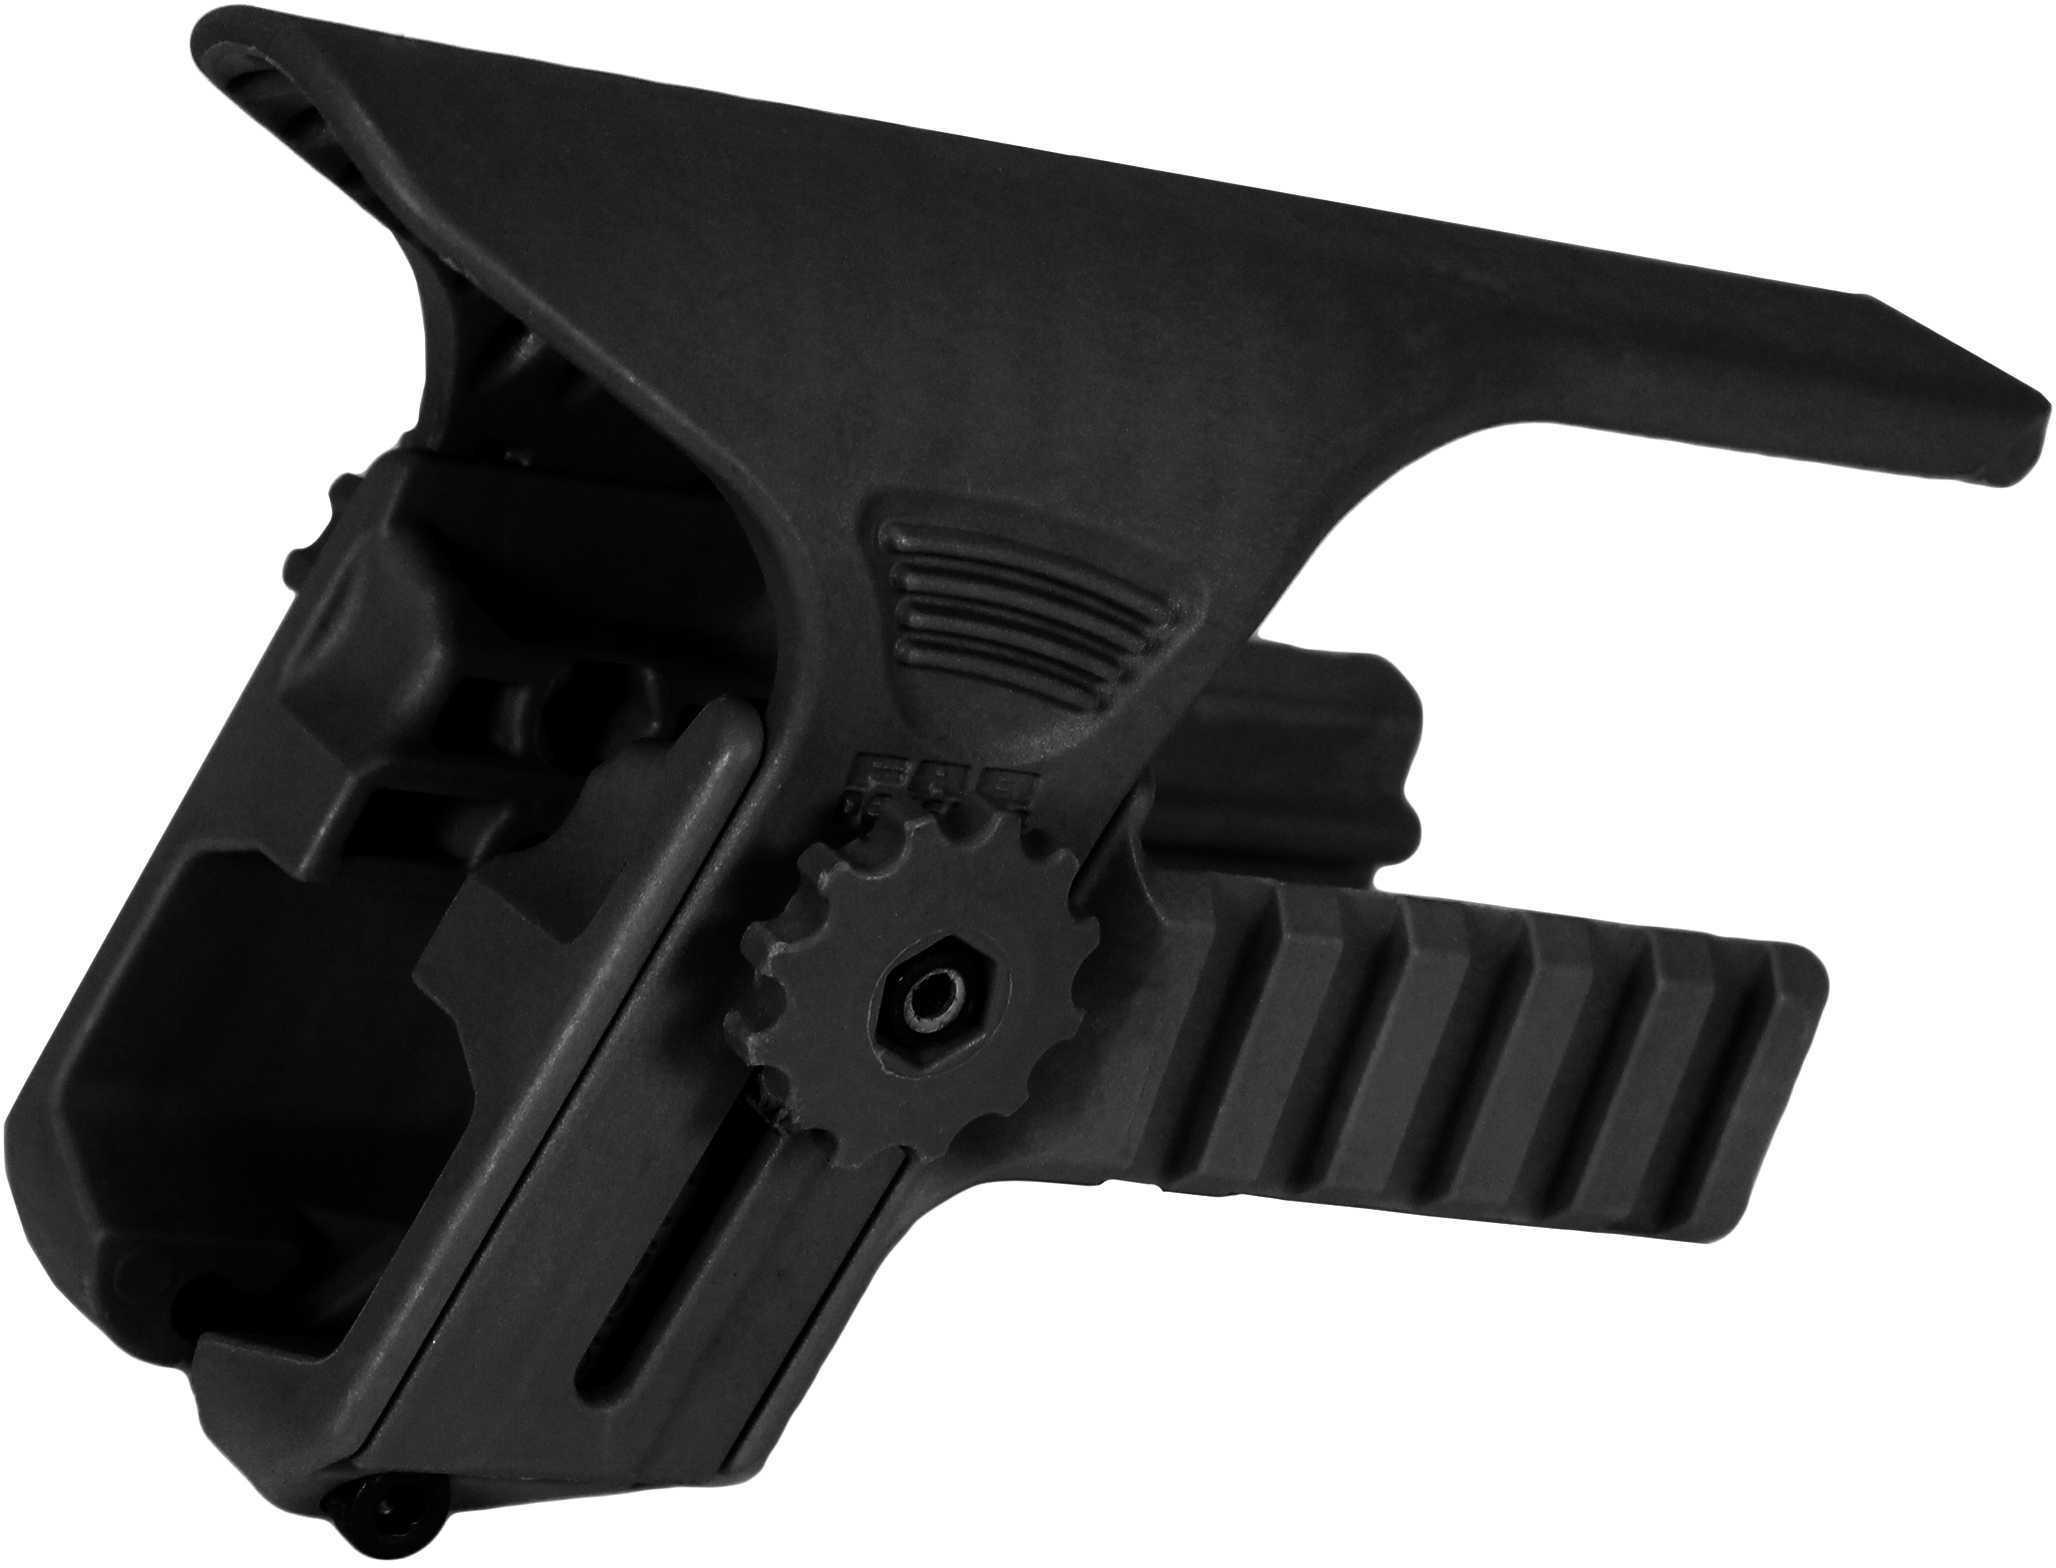 Mako Group Adjustable Cheek Riser with Picatinny Rail for GL-SHOCK, Black